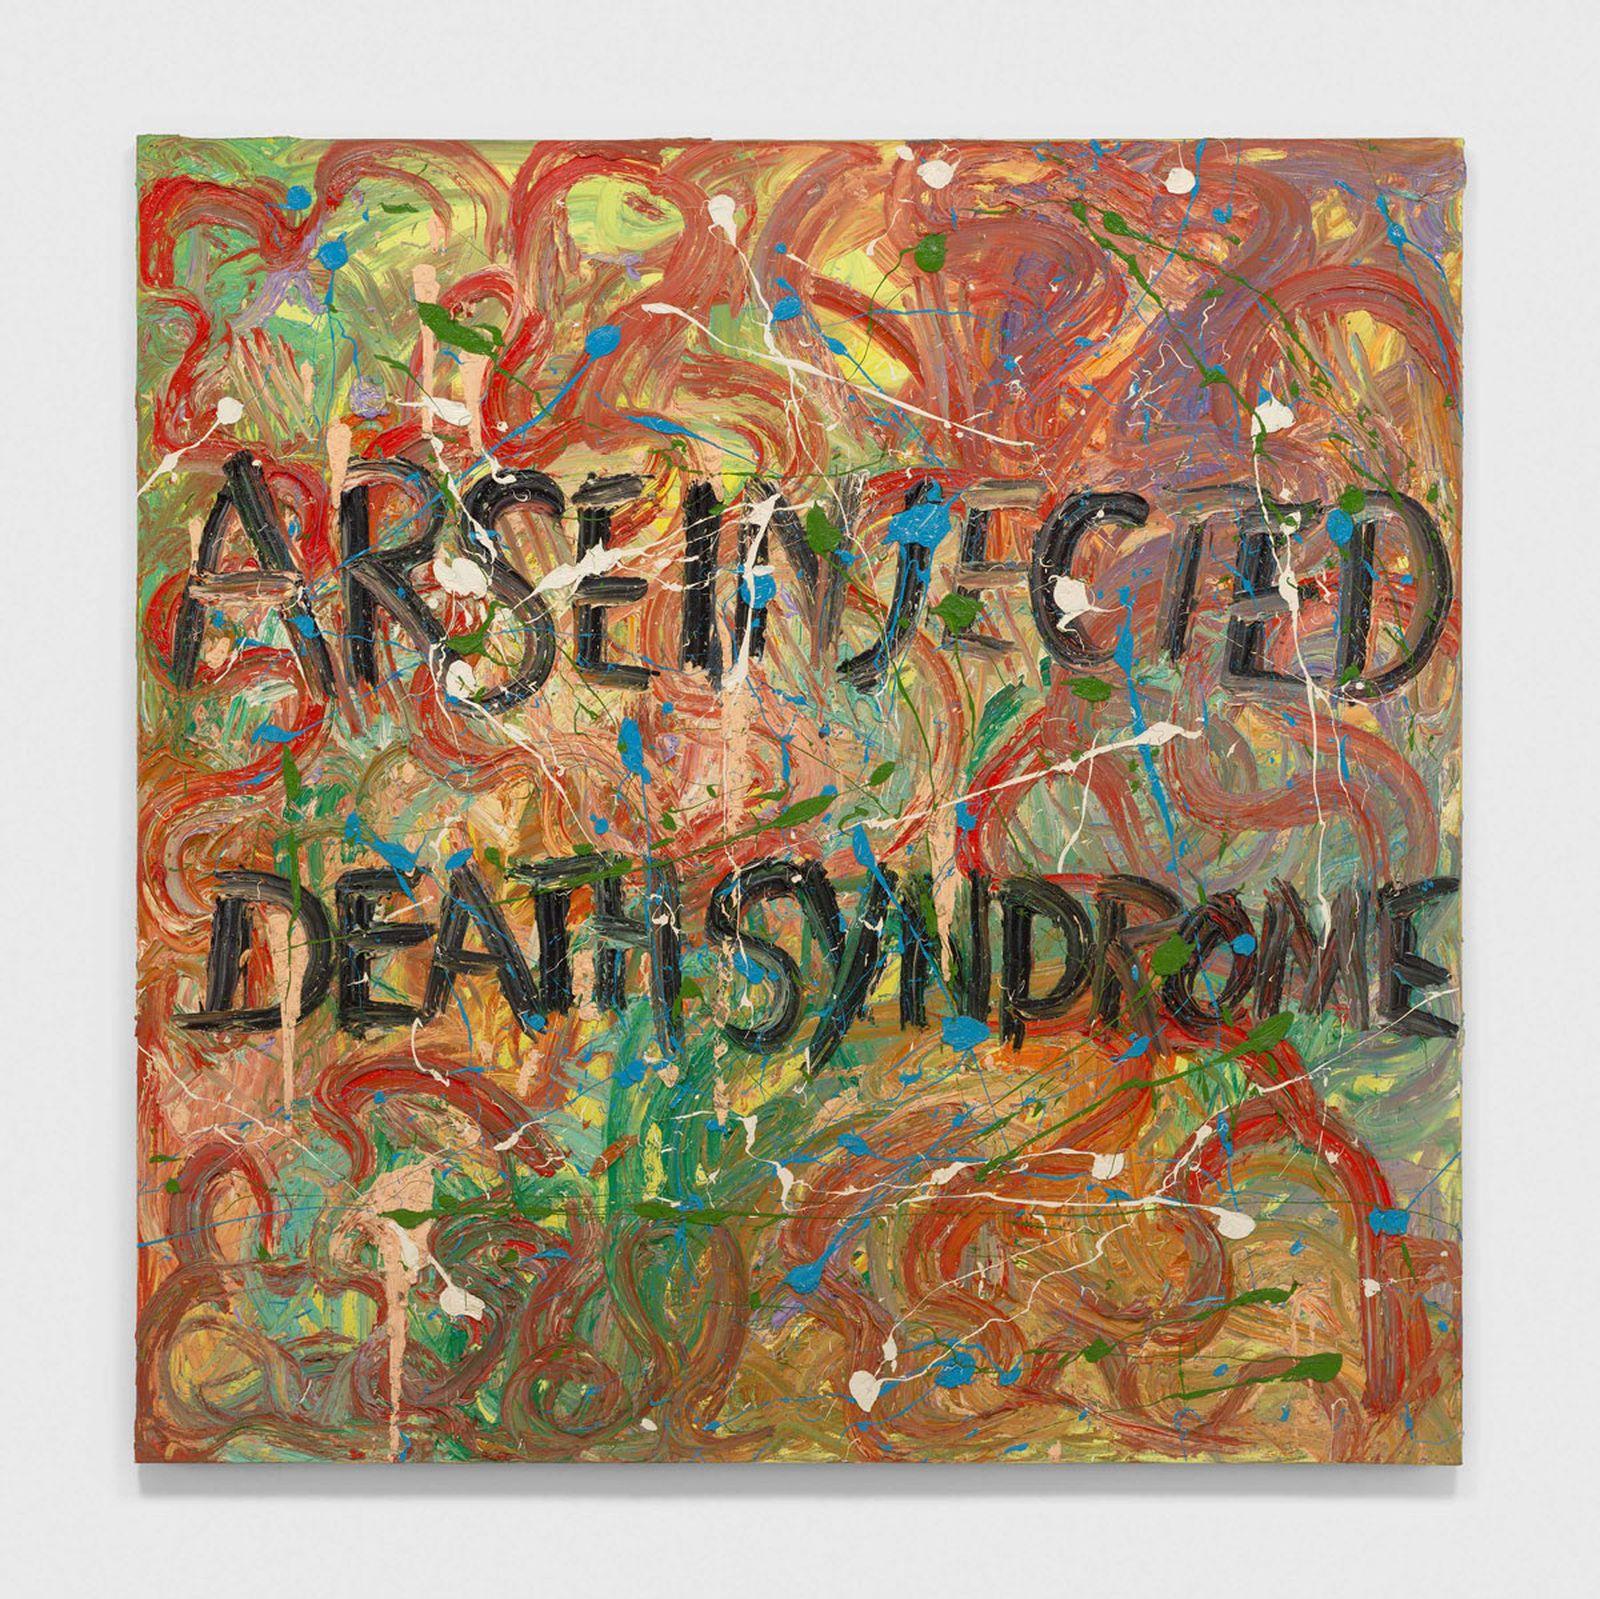 Derek Jarman, Arse Injected Death Syndrome, 1993